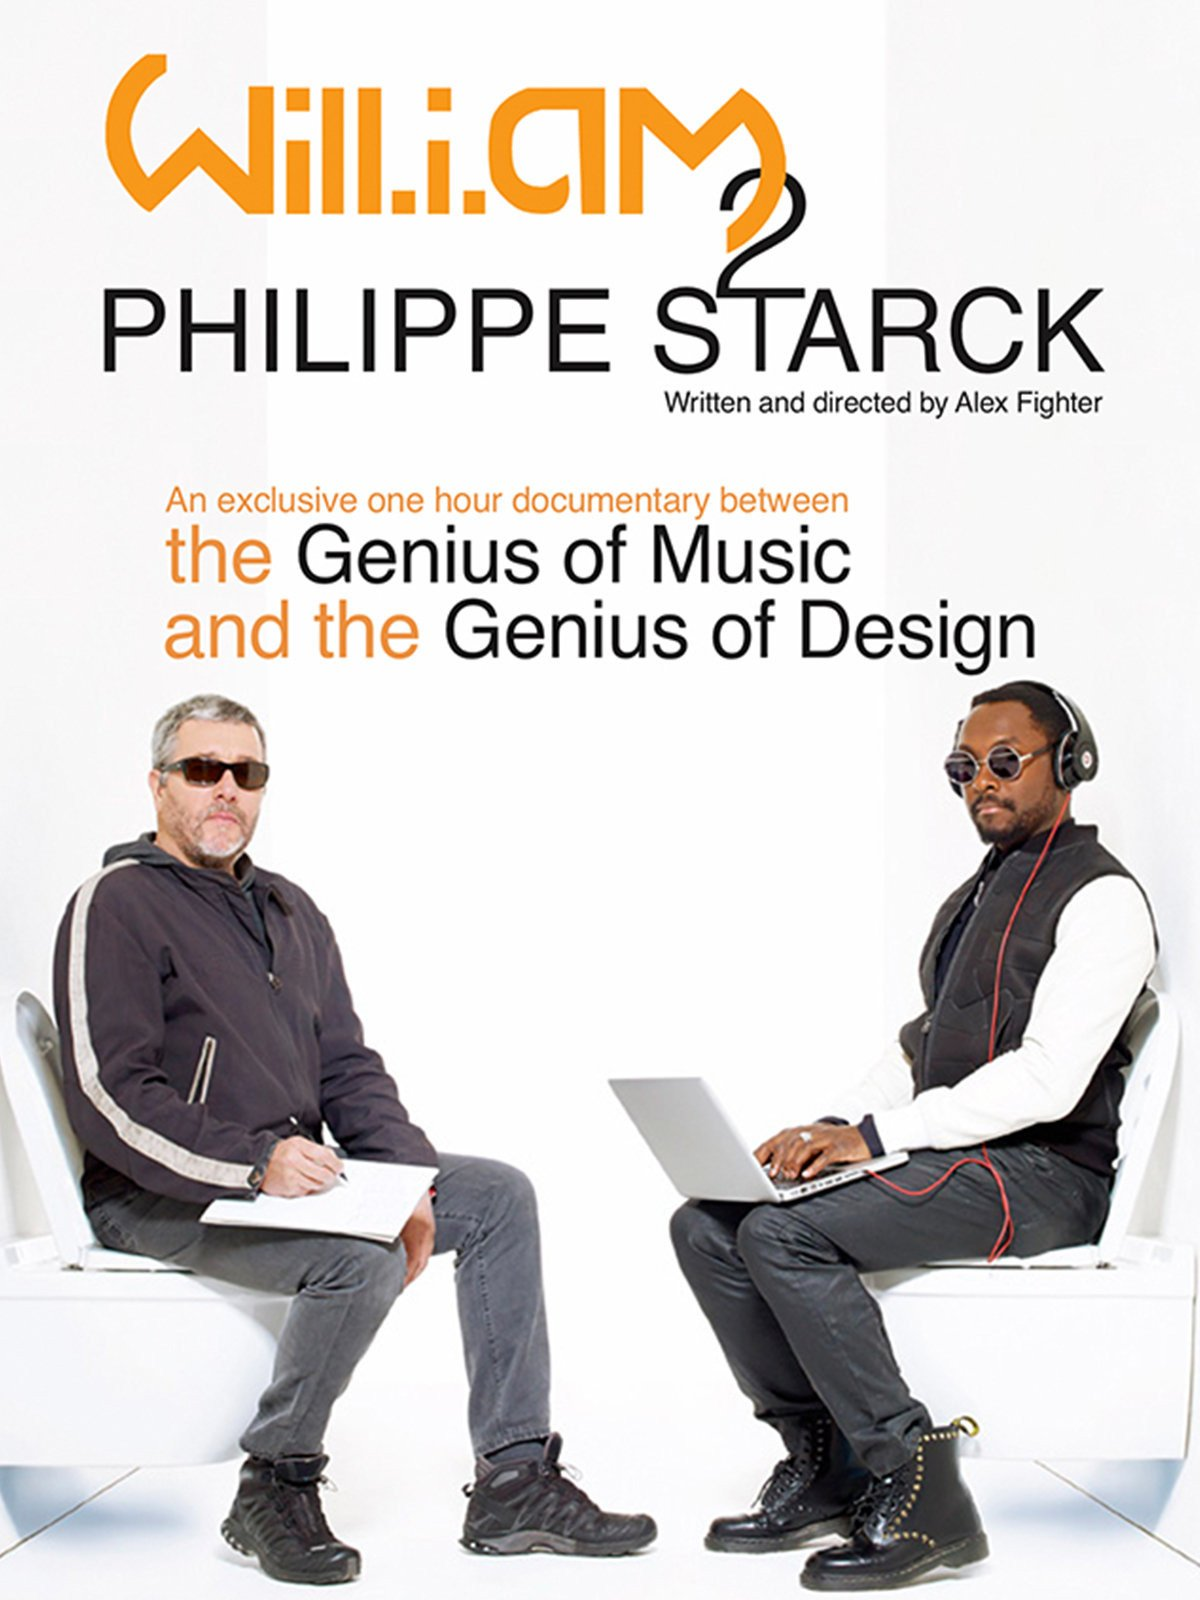 Will.I.Am 2 Philippe Starck on Amazon Prime Video UK